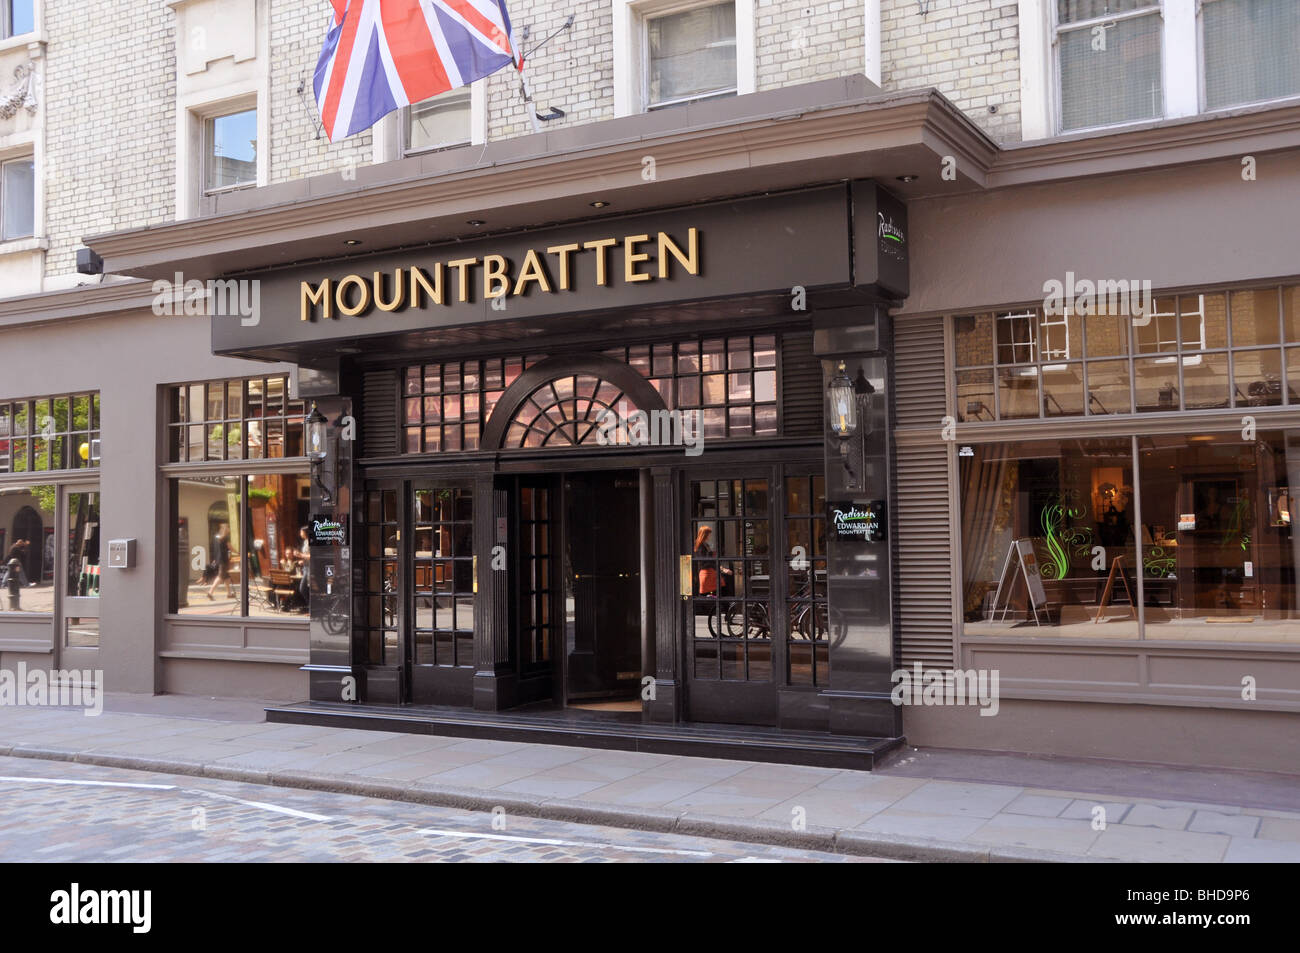 Covent Garden Hotels In London Garden Ftempo